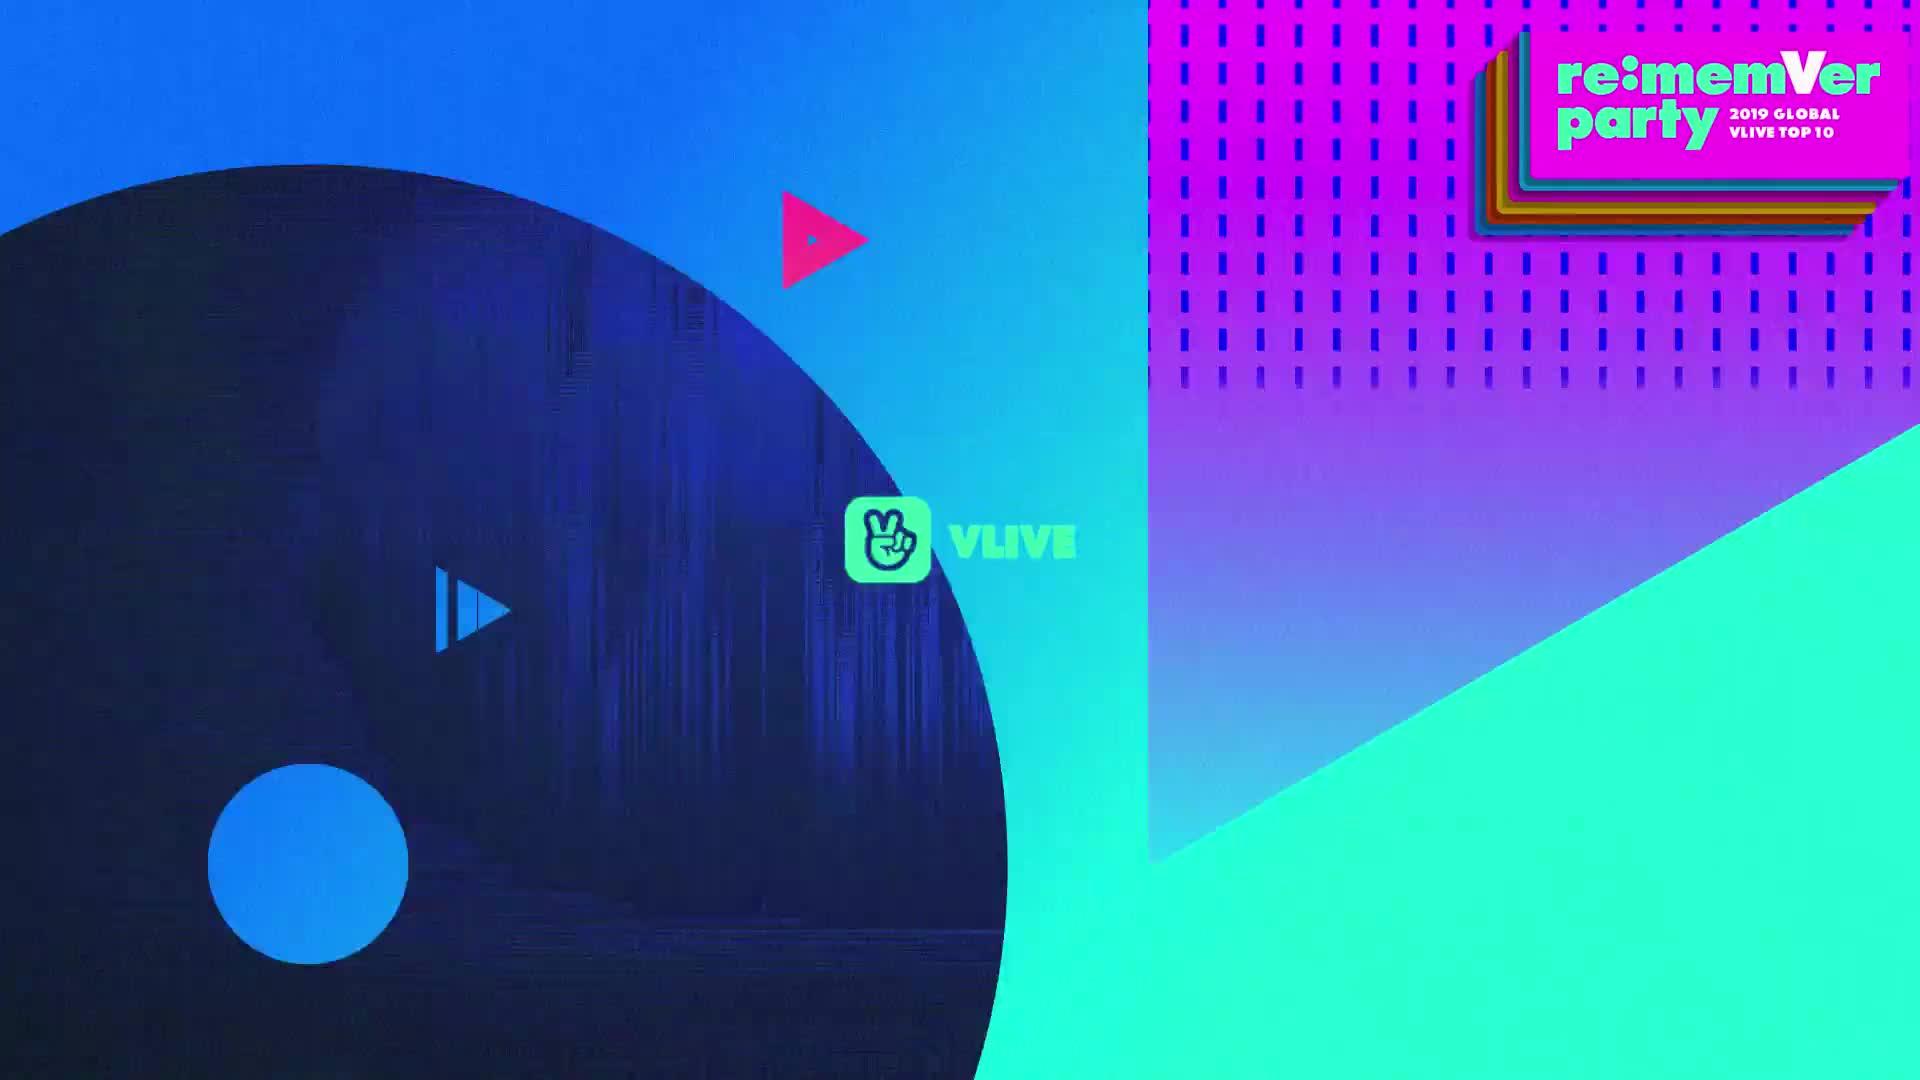 GOT7 리멤버파티 시상식 파트 2 / 2019 GLOBAL VLIVE TOP 10